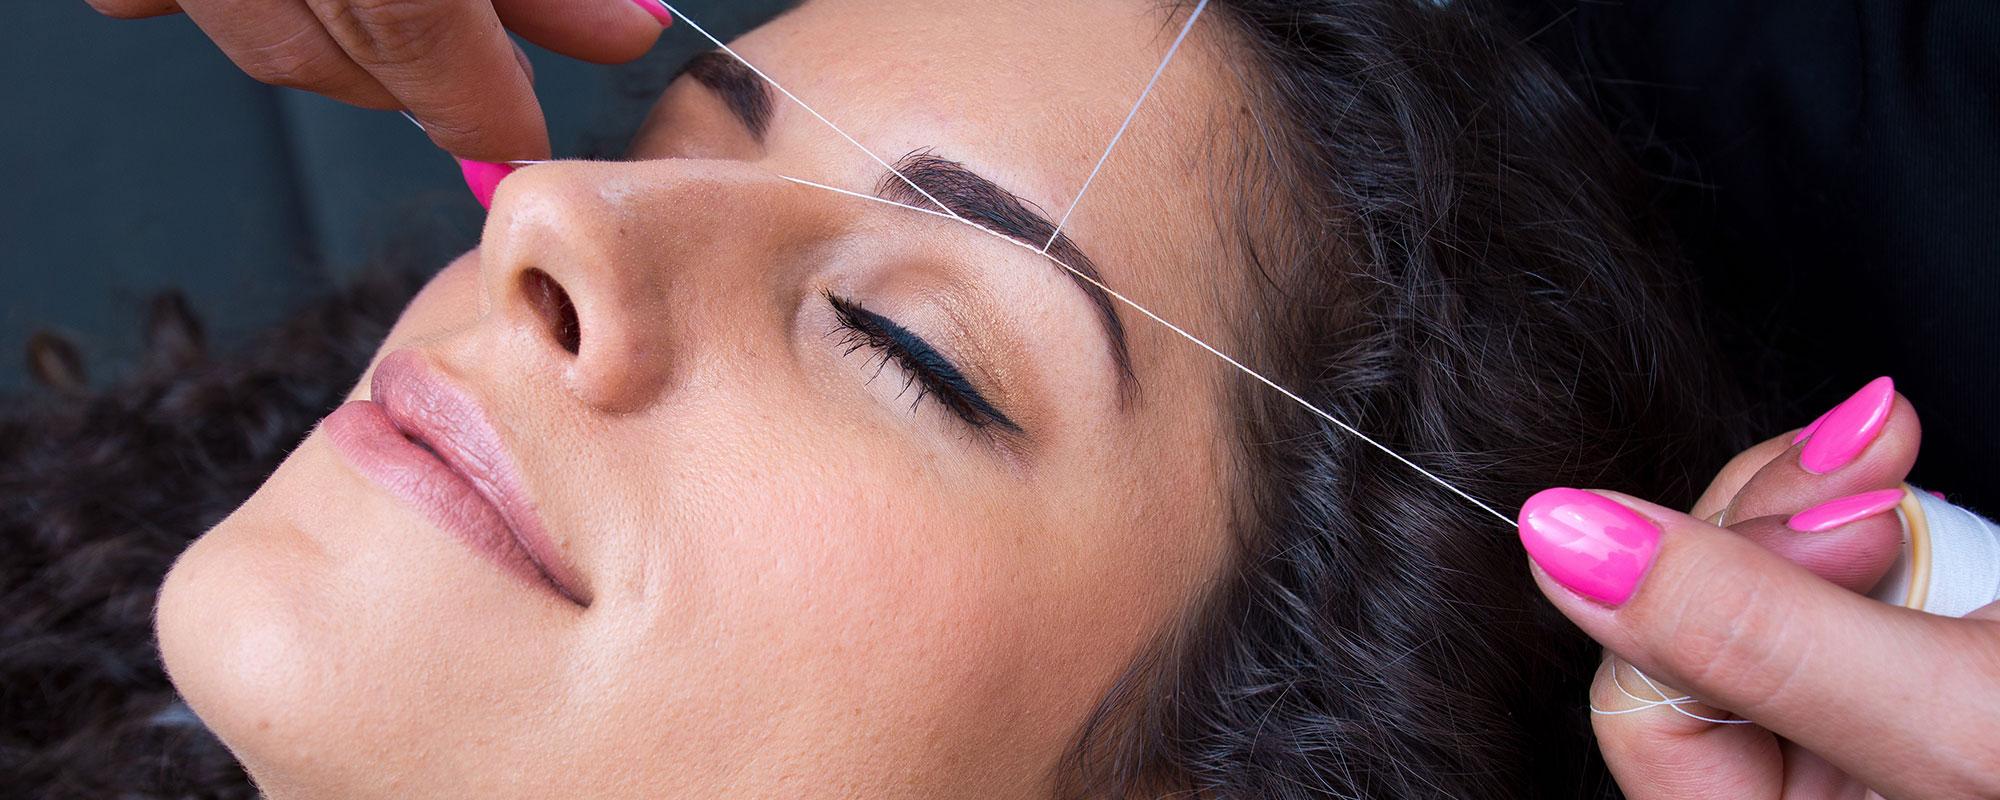 Preesha Threading Salon Eyebrows Threading Facials Henna